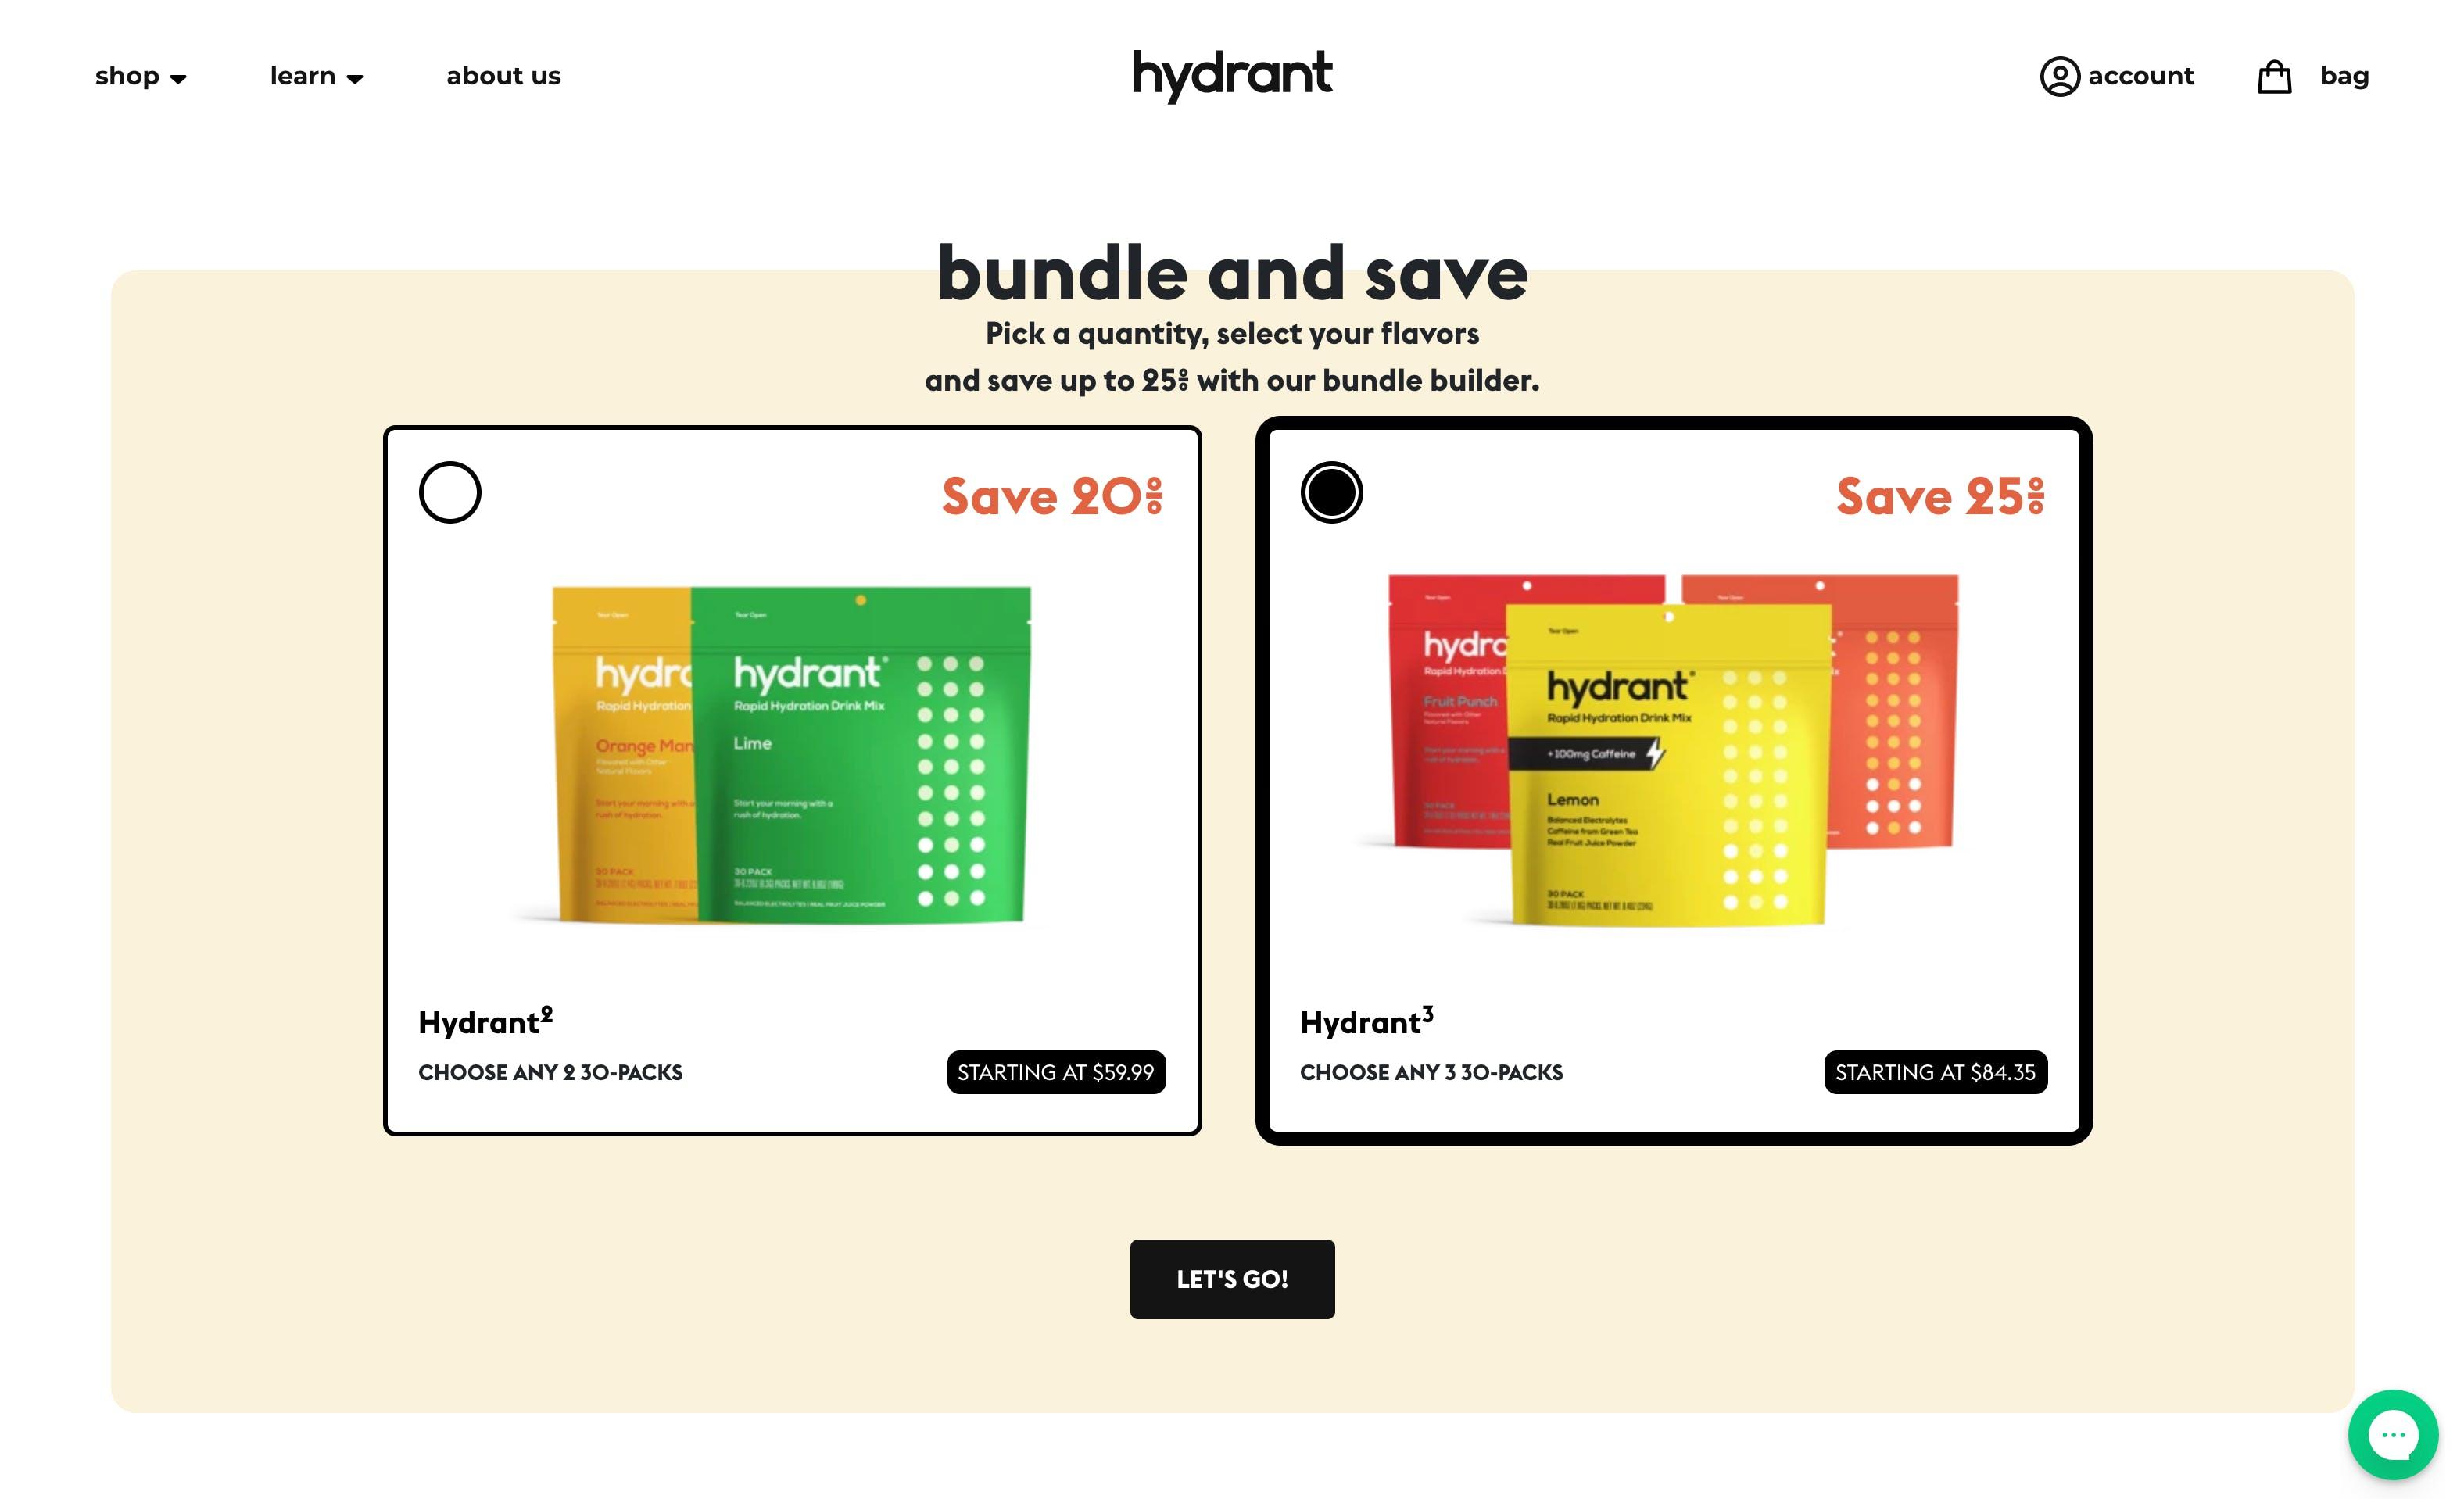 Hydrant bundles